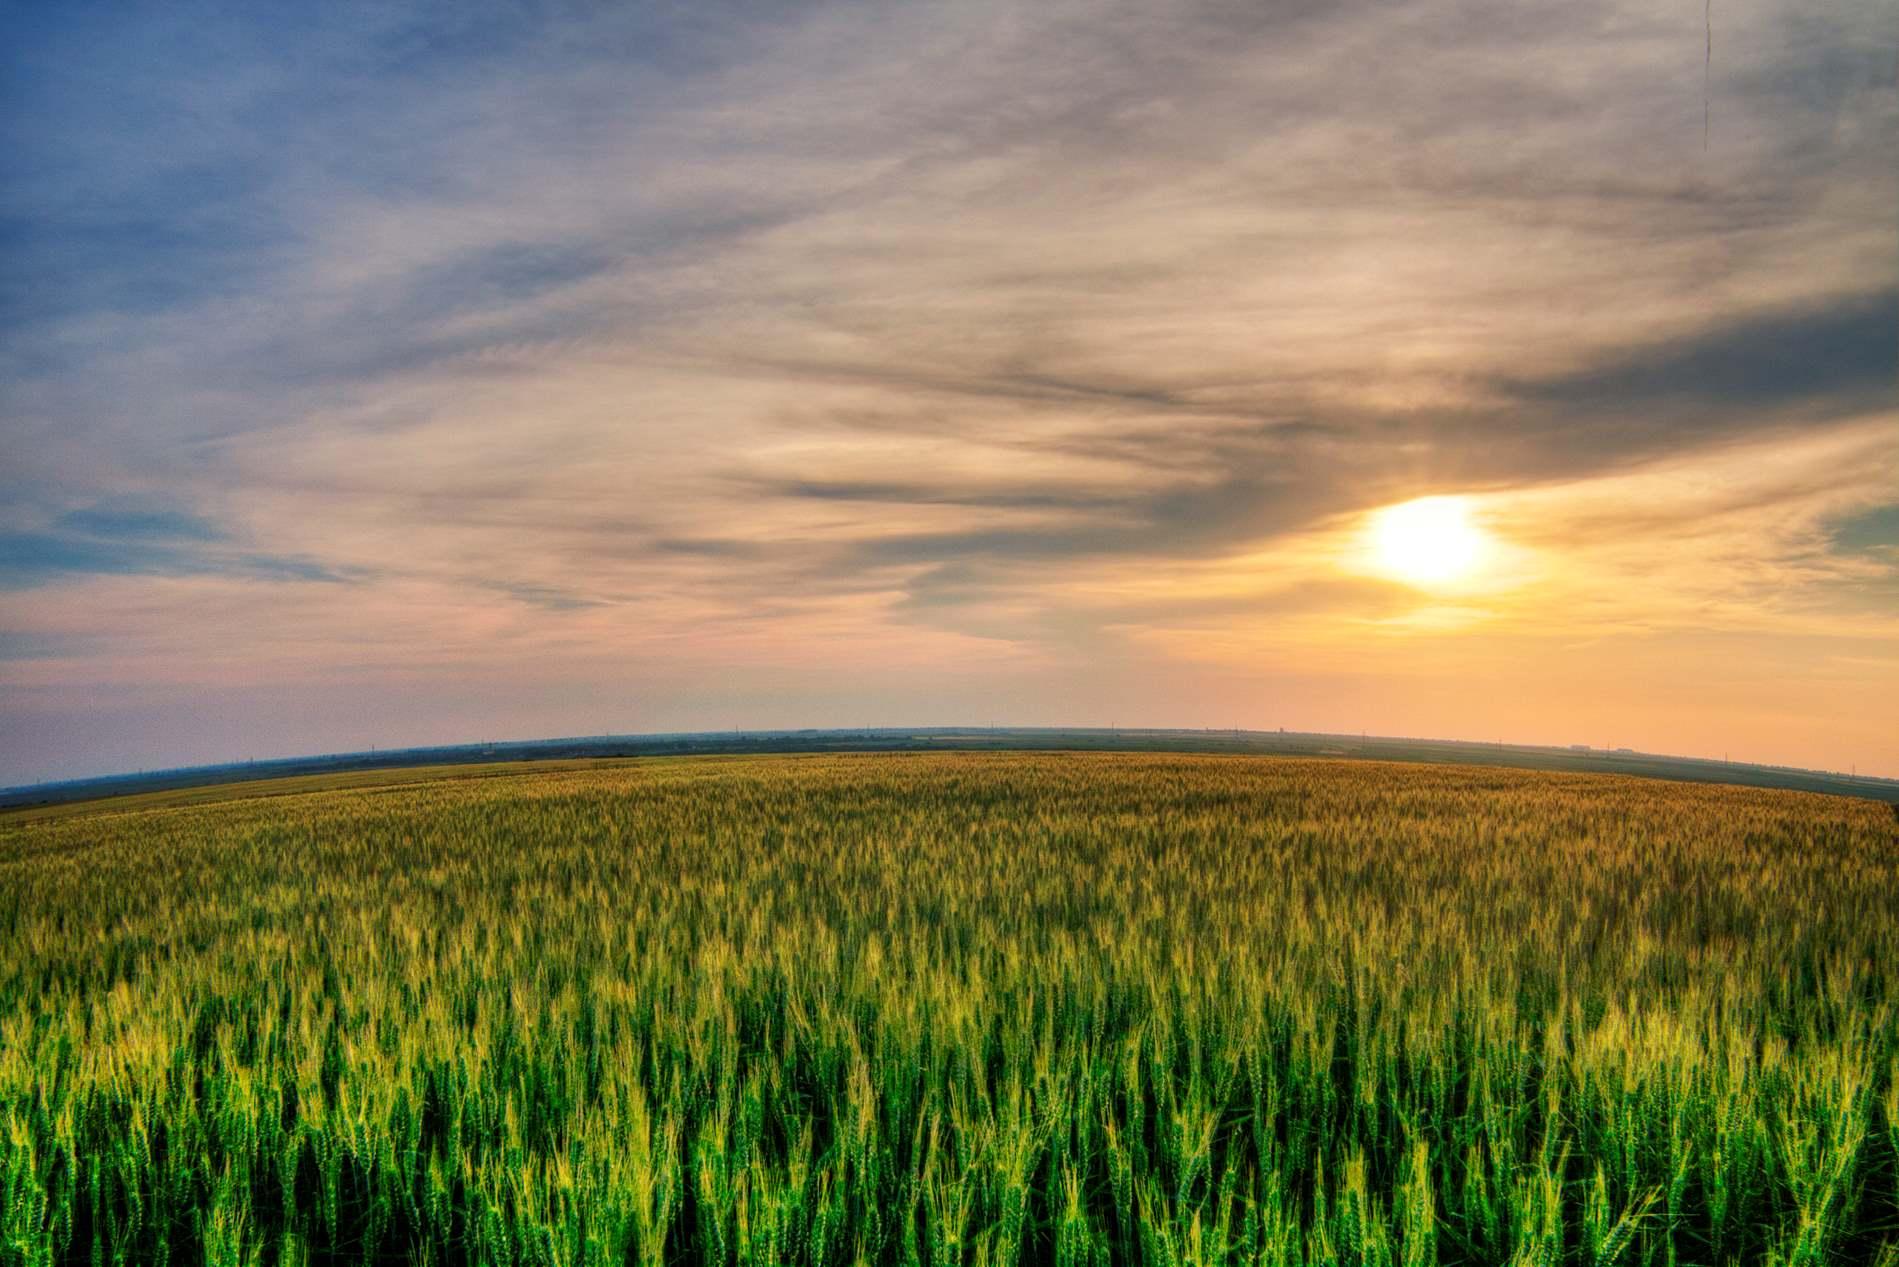 Sunset Sky Green Field Background   PhotoHDX 1899x1267